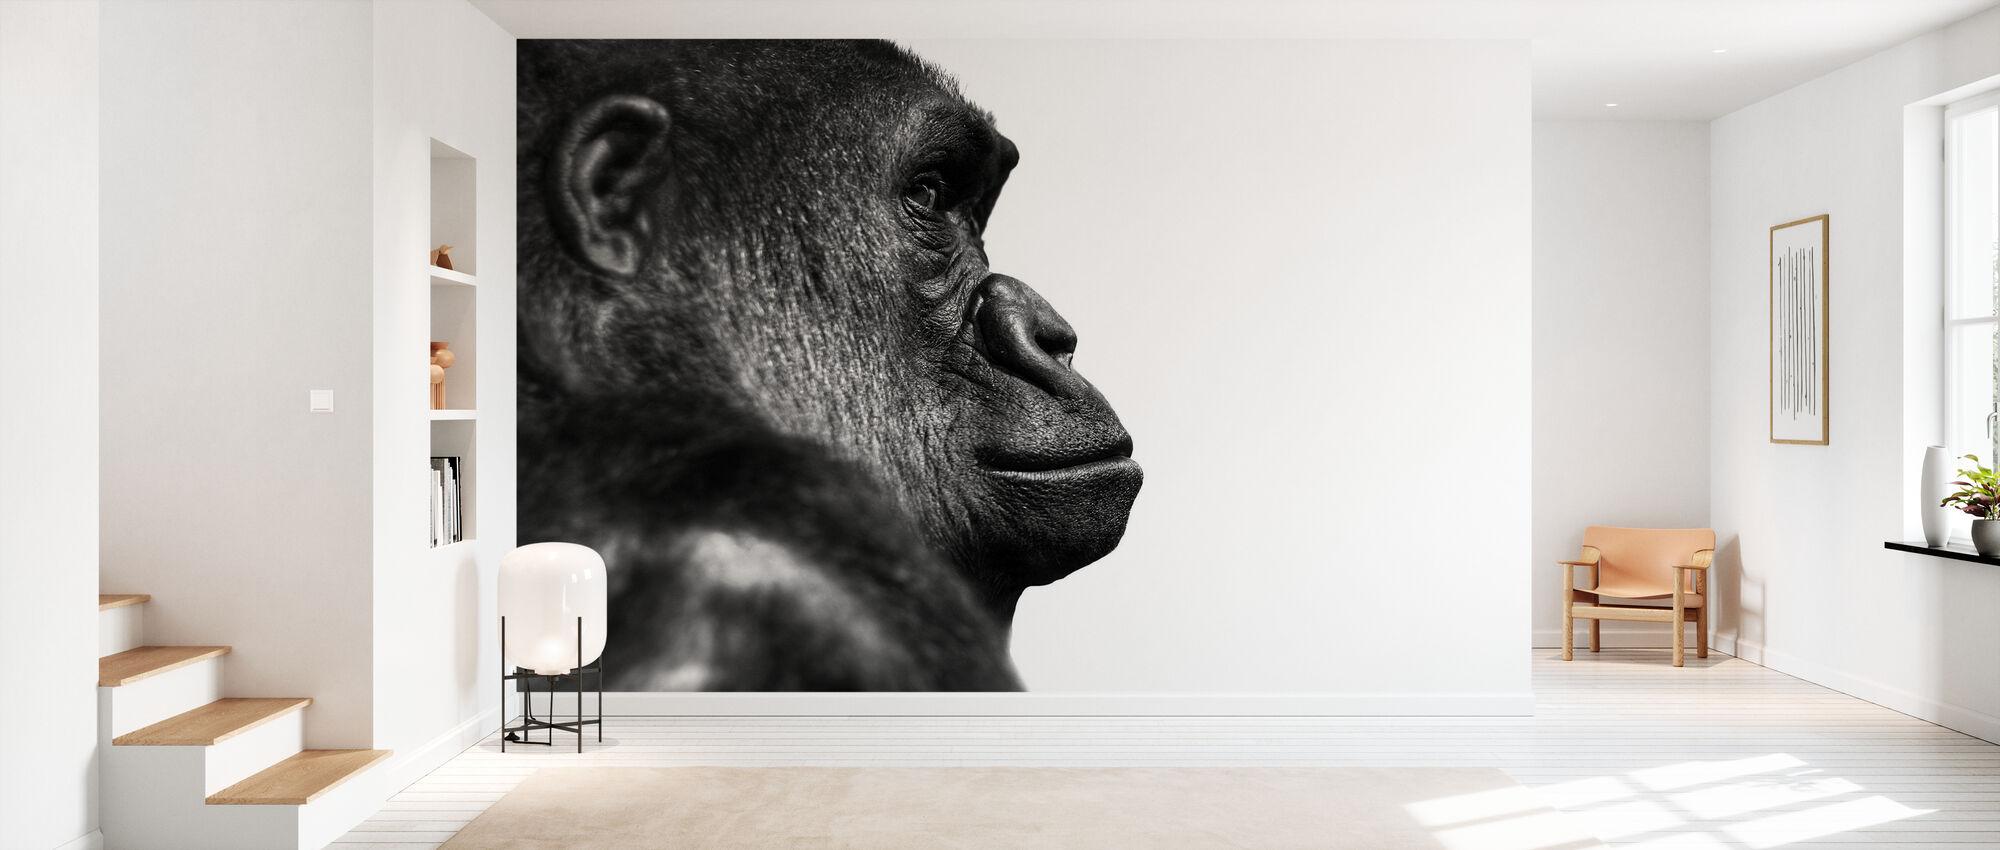 Gorilla - b/w - Wallpaper - Hallway